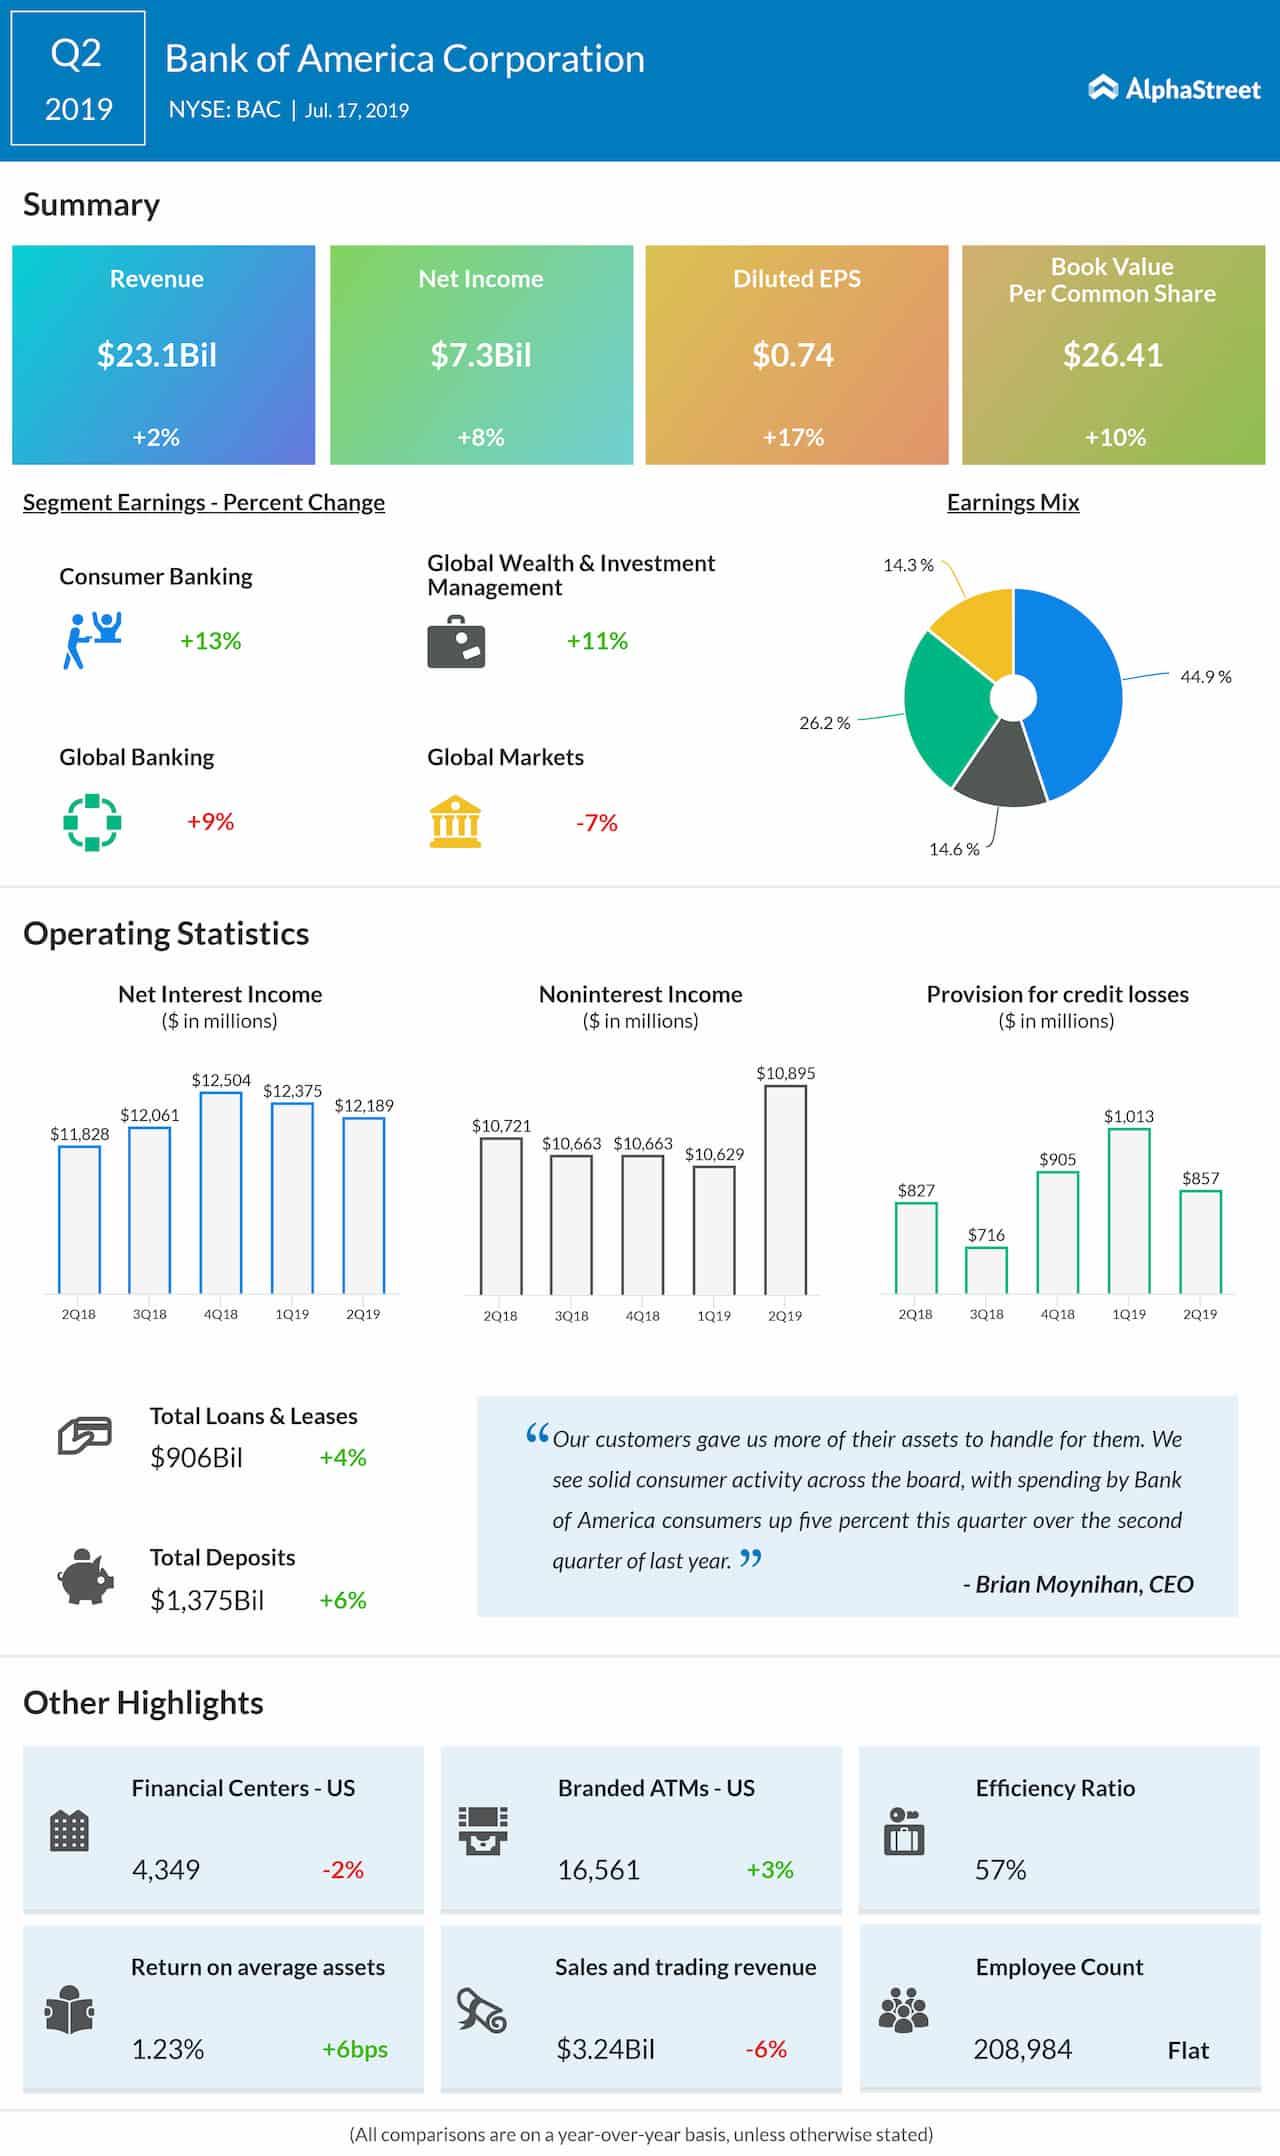 Bank of America (BAC) Q2 2019 earnings | AlphaStreet